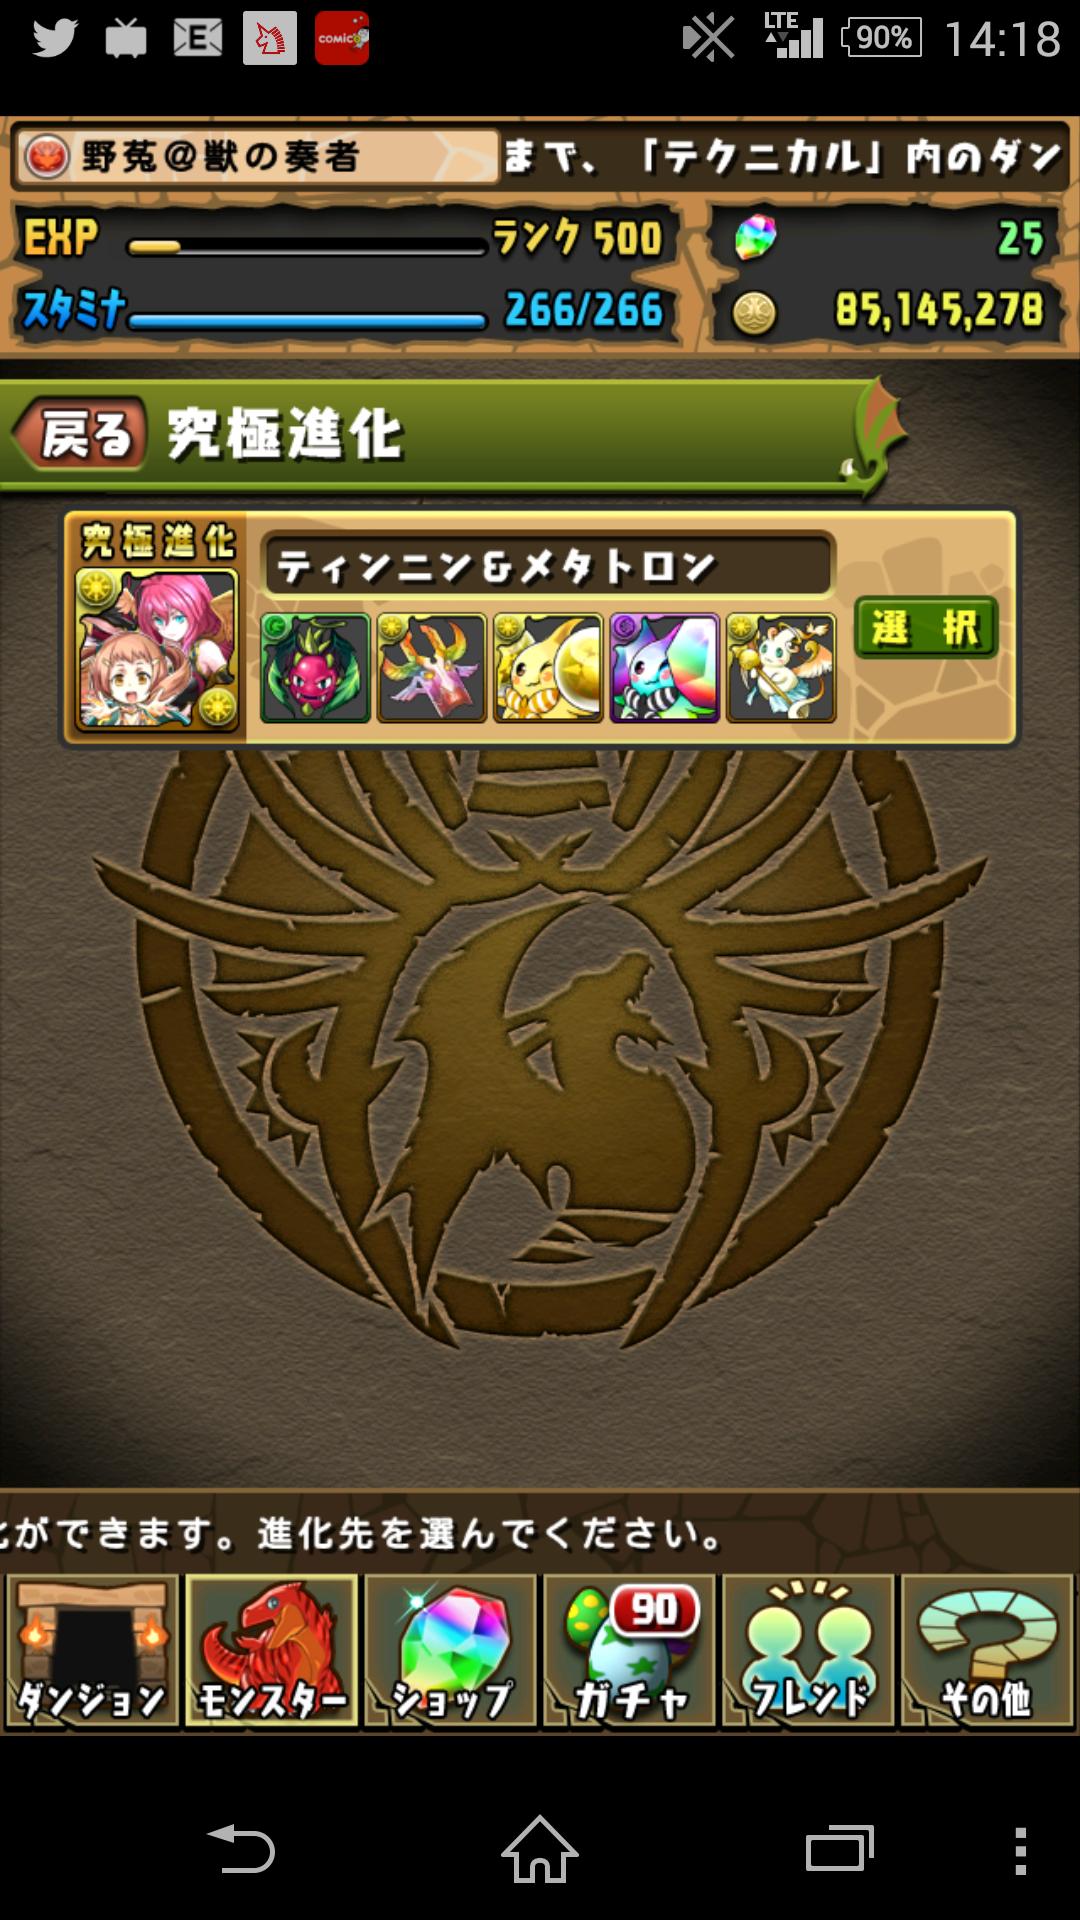 Screenshot_2015-05-11-14-18-48.png